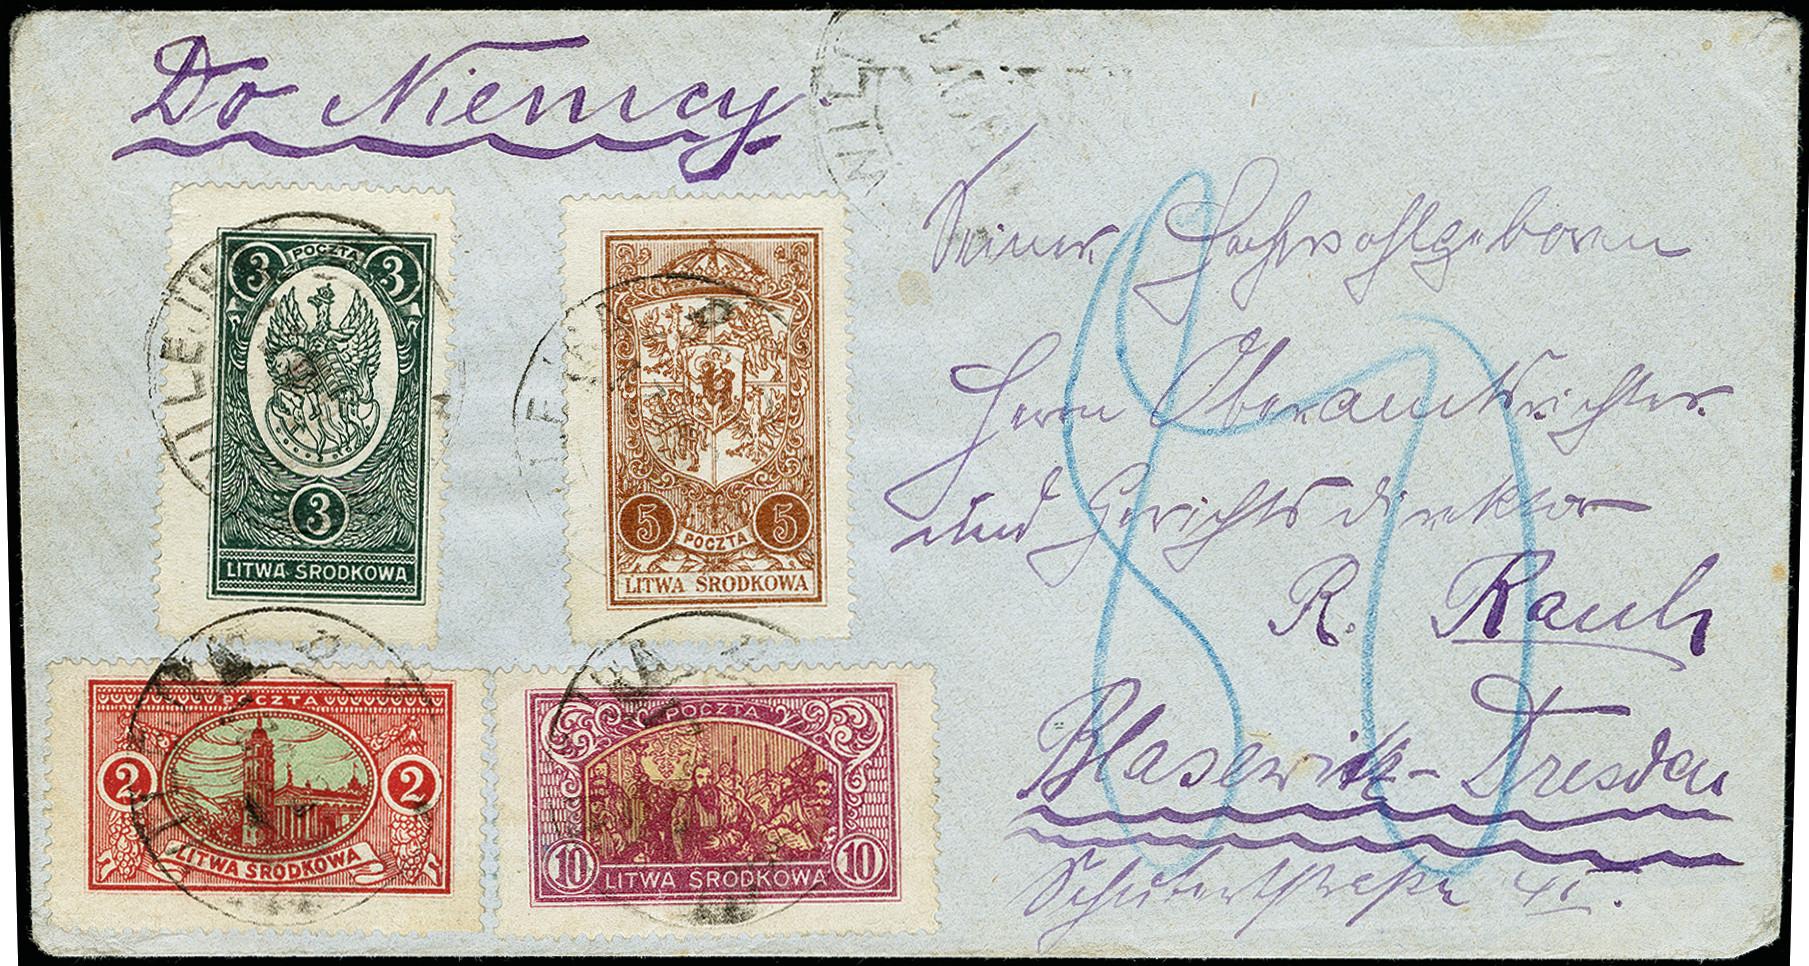 Lot 175 - europe central lithuania -  Heinrich Koehler Auktionen 373rd Heinrich Köhler auction - Day 1